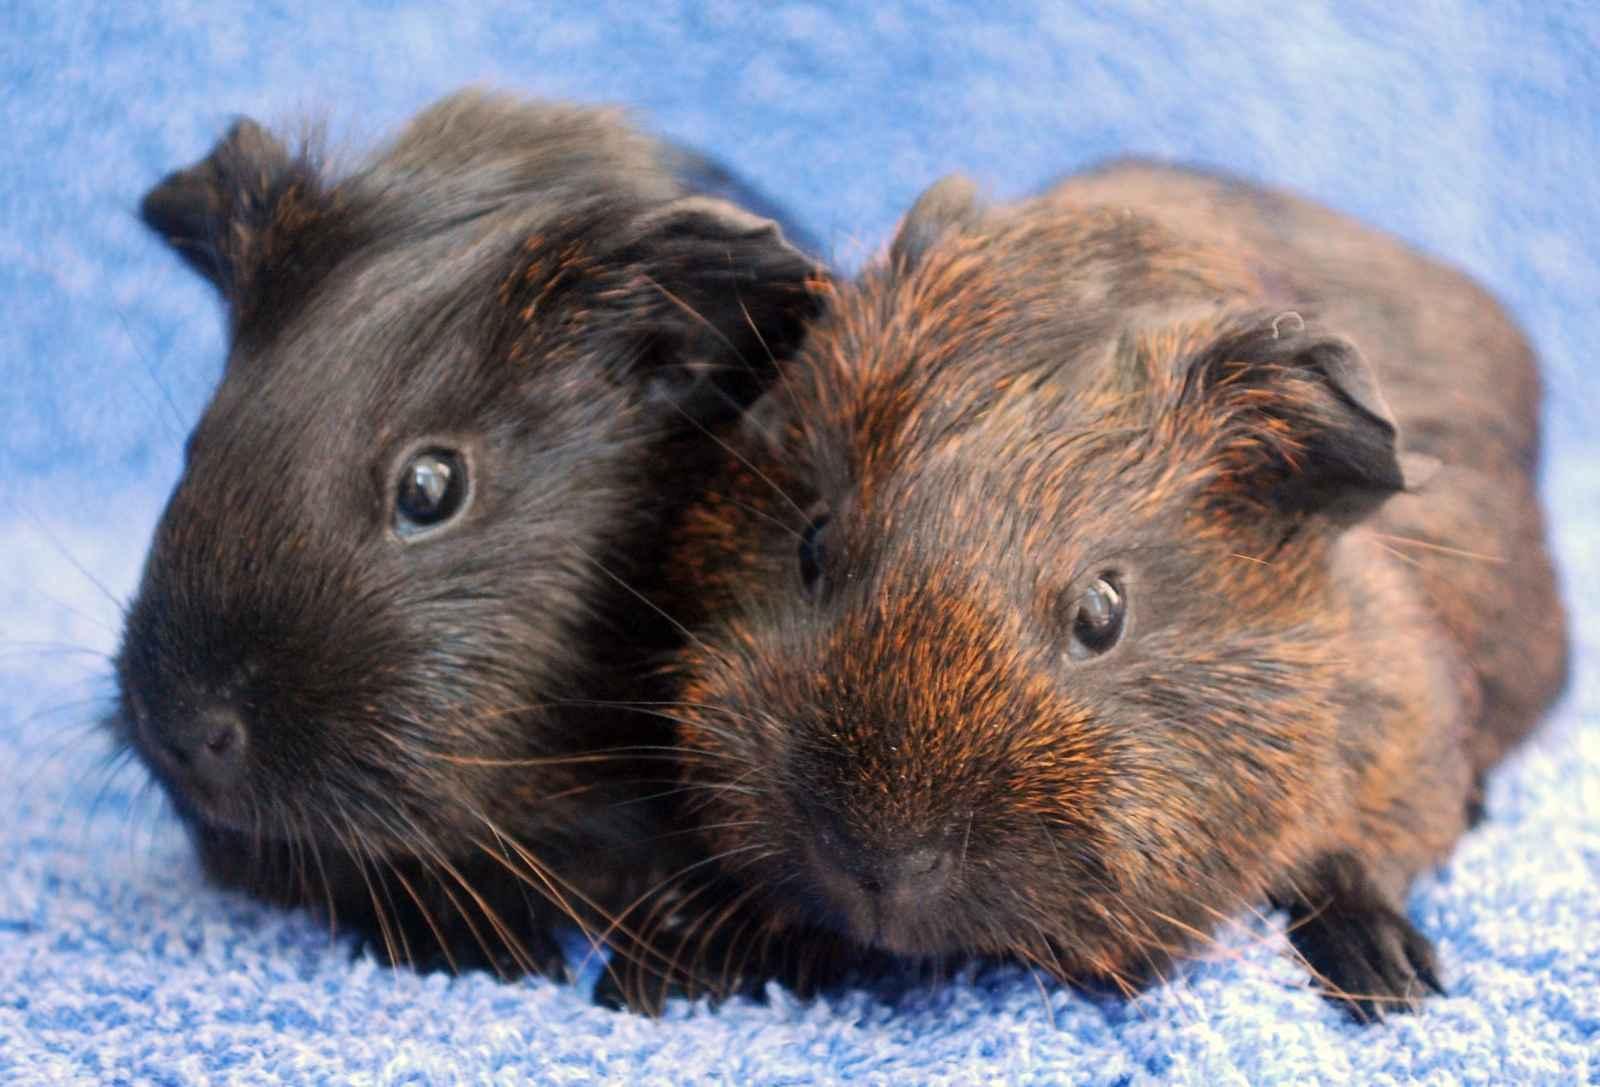 Guinea pigs guinea pigs photo 15107697 fanpop for Guinea pig pictures free